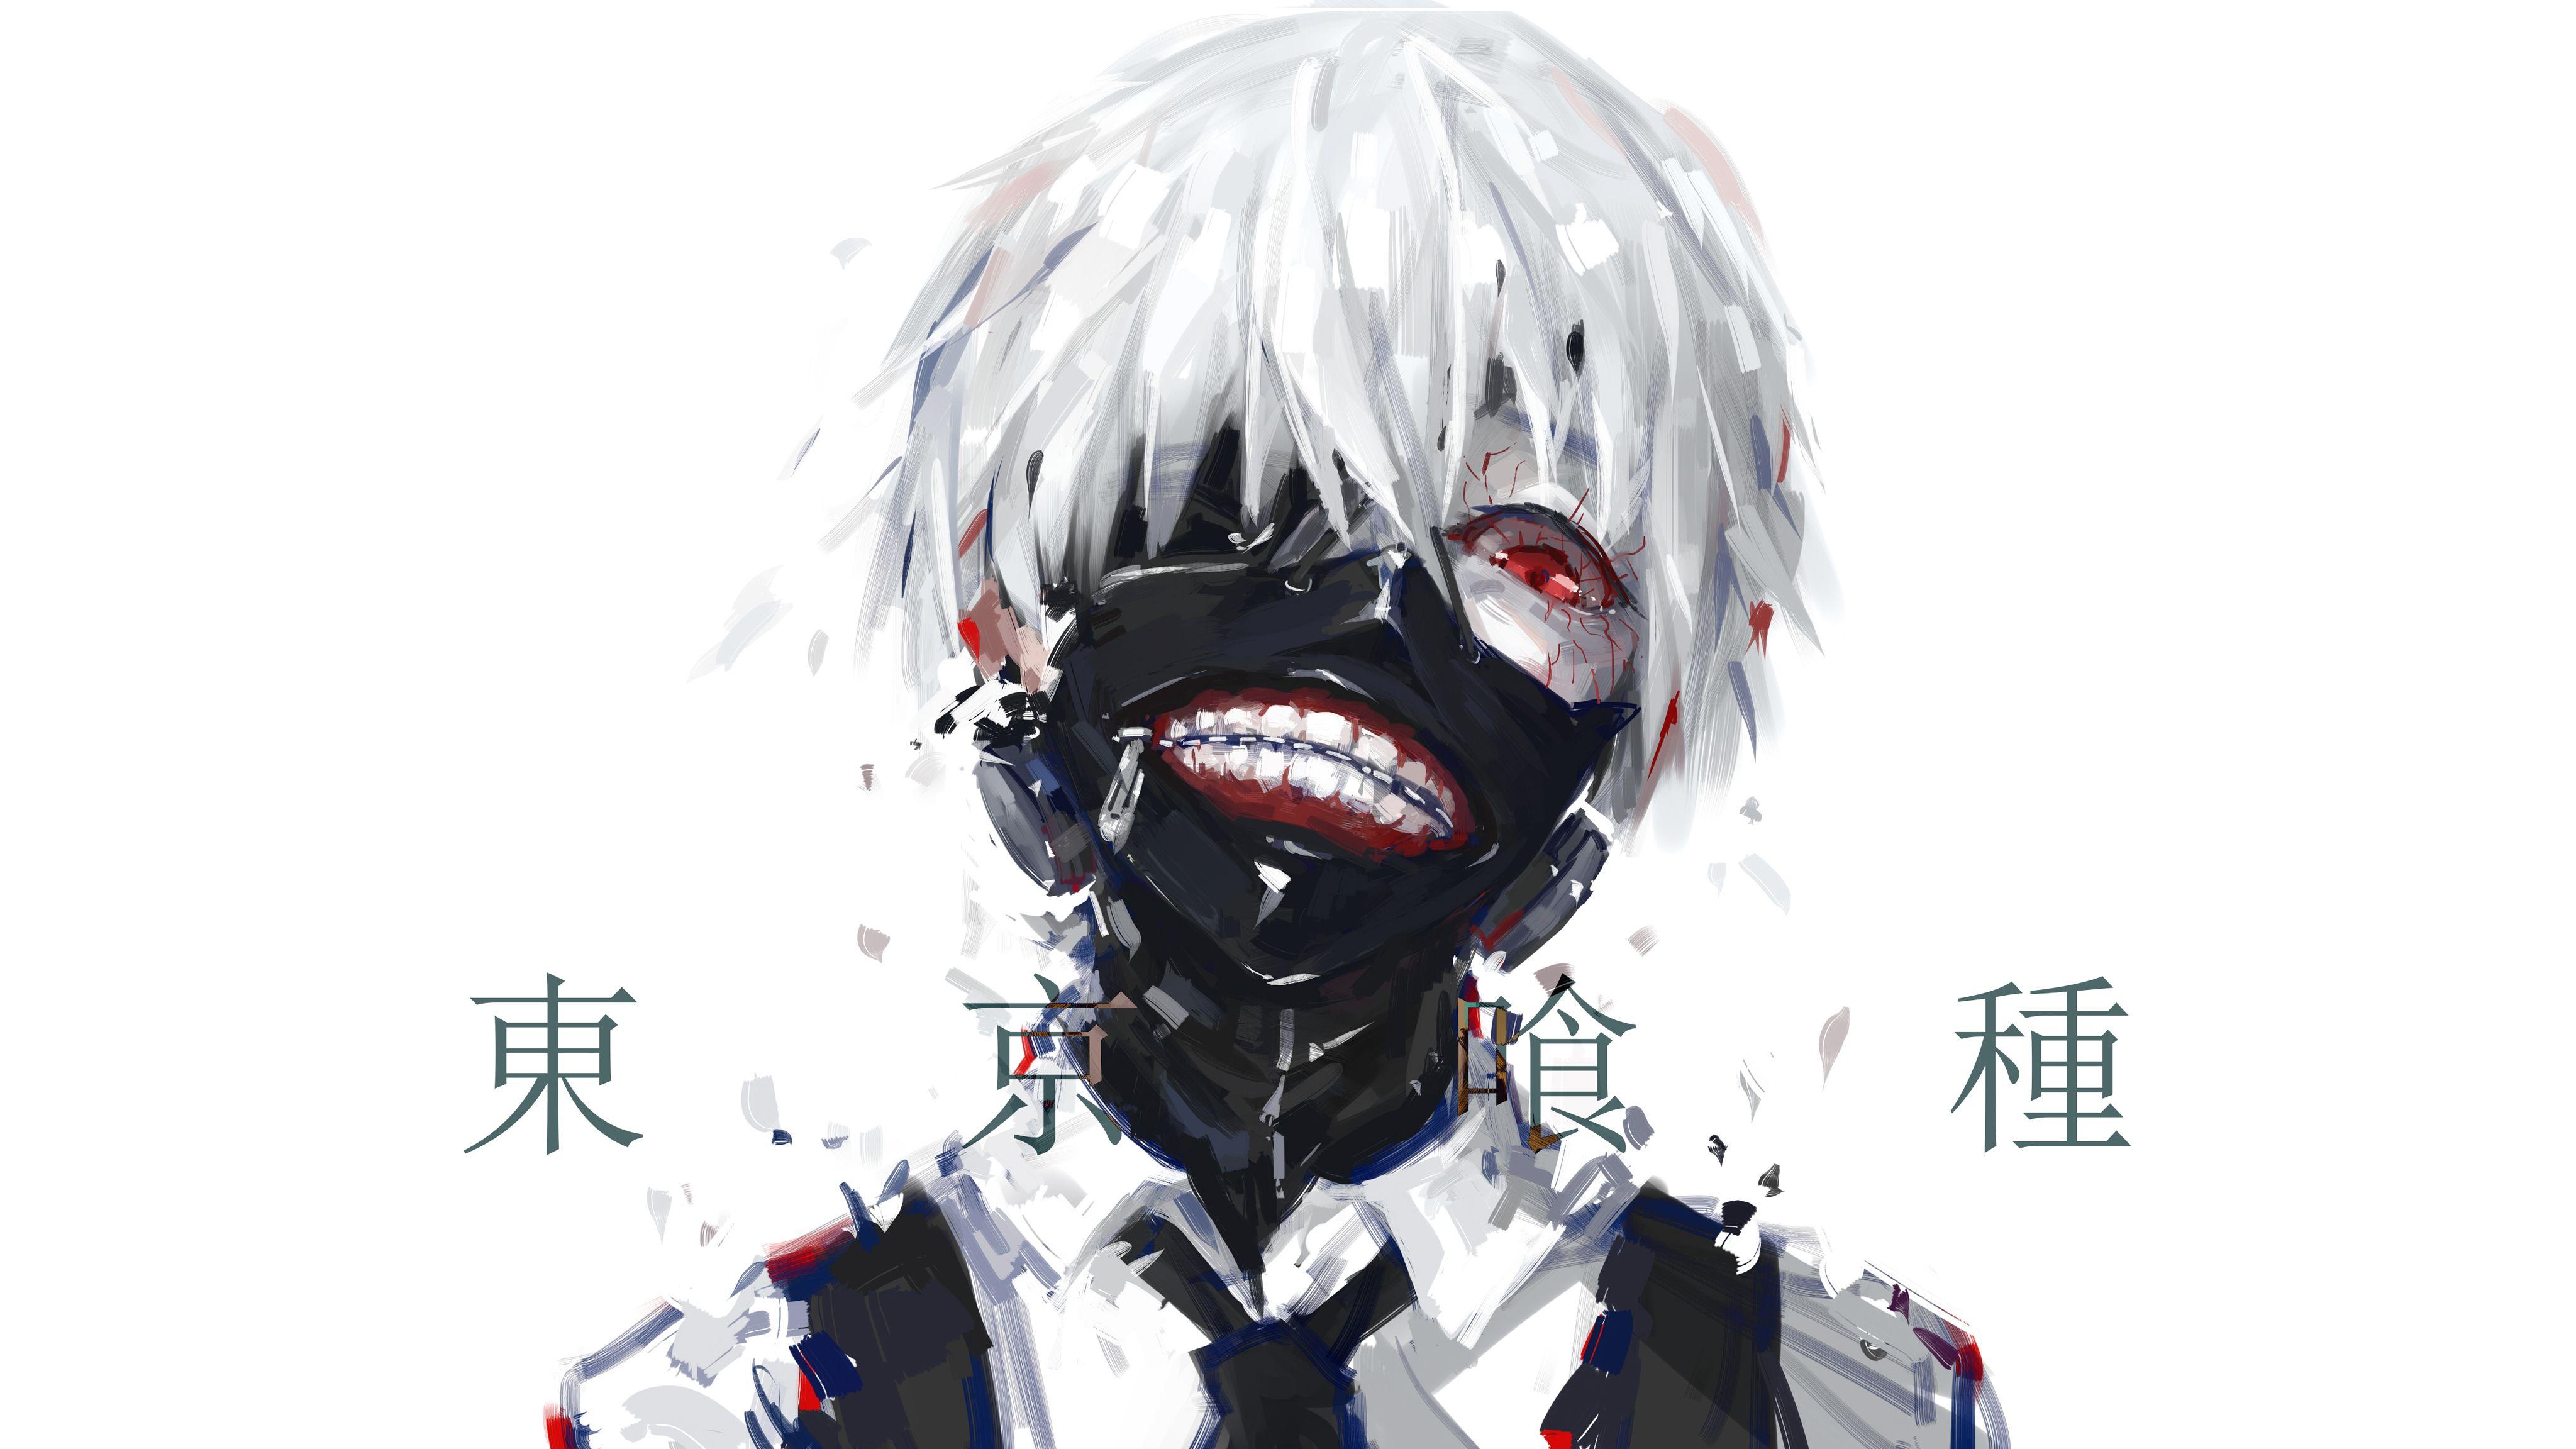 Tokyo Ghoul,Anime,Wallpaper,